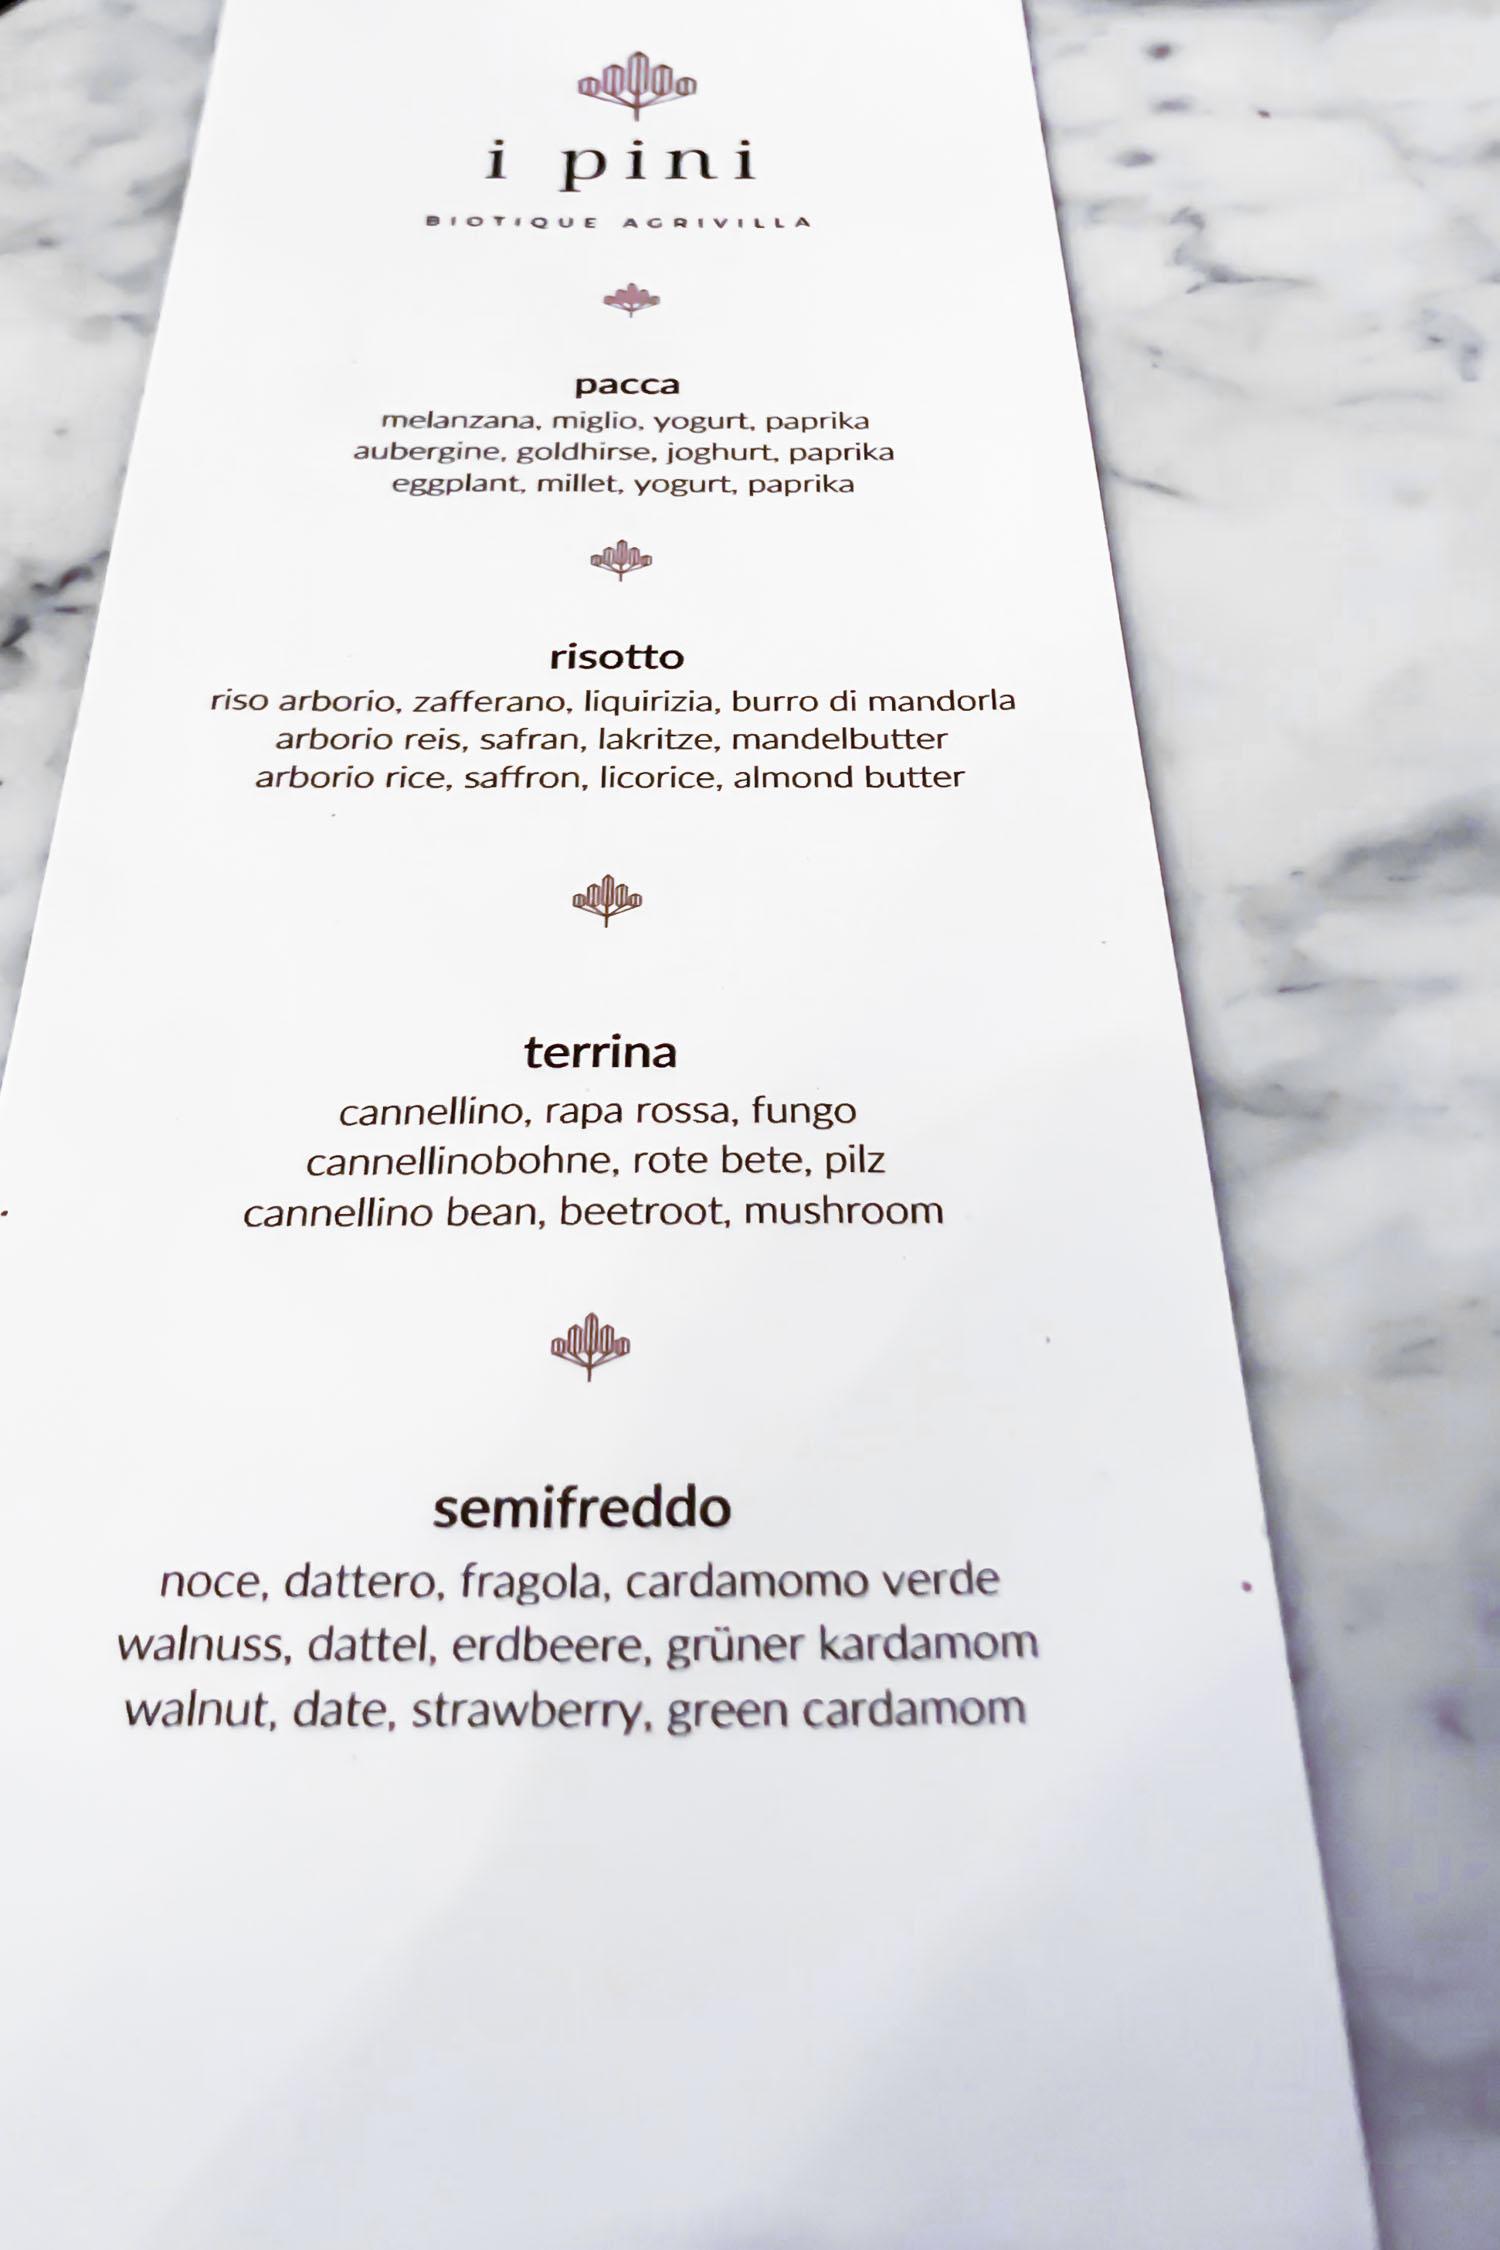 The menu changes daily at i pini, an organic vegan Italian farmhouse in Tuscany, Italy. #tuscany #travel #italy #italianfarmhouse #olivegroves #oliveoil #vineyards #italyinautumn #veganrestaurant #vegantravel #italytravel #veganitaly #vegantuscany #veganhotel #ecotourism #organichotel #veganhotel #veganretreat #veganbedandbreakfast #sangimignano